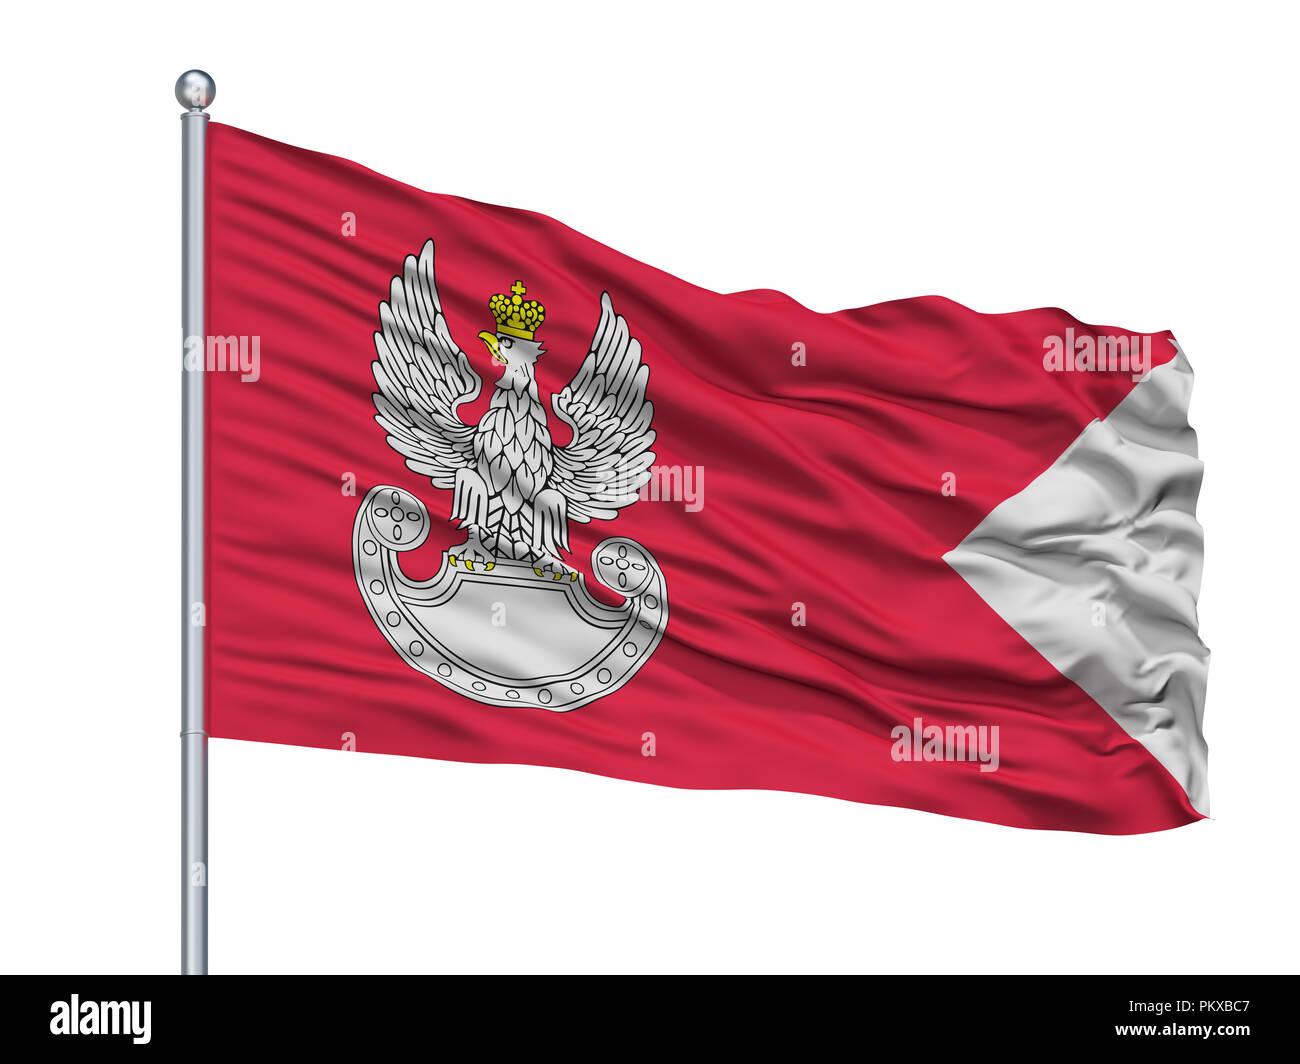 Polish Land Forces Flag On Flagpole, Isolated On White Background, 3D Rendering - Stock Image